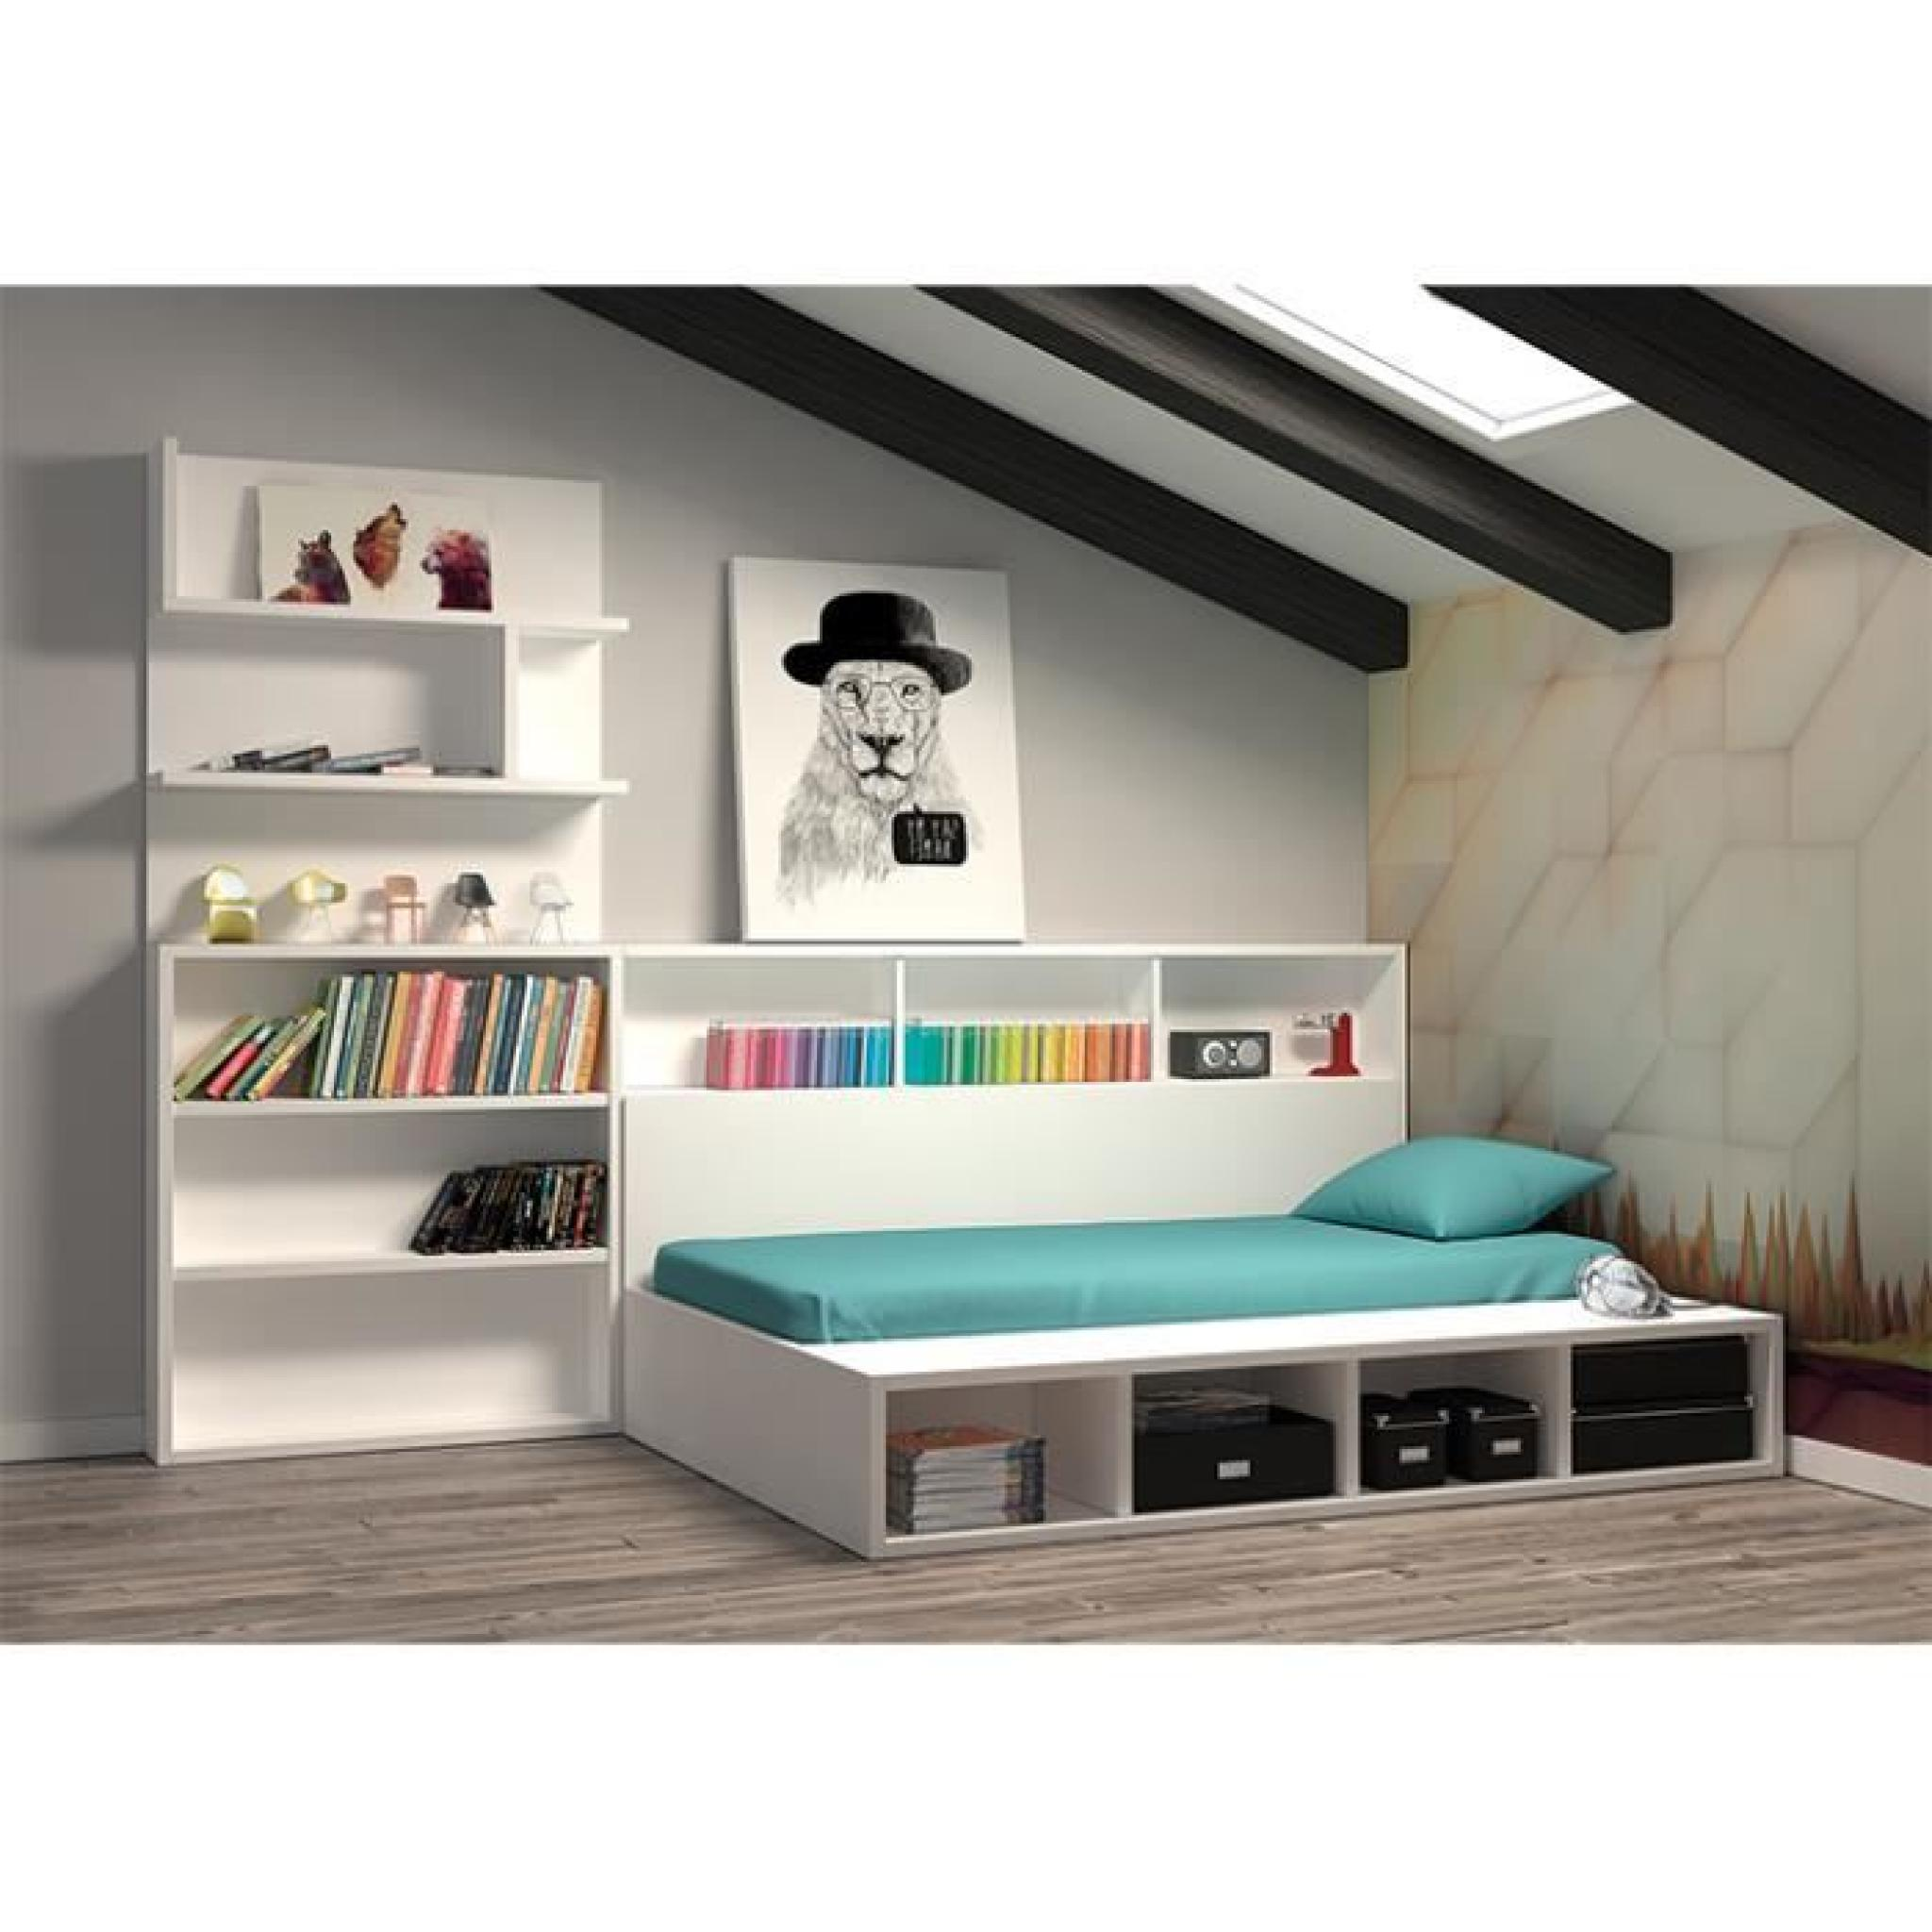 Chambre edmond lit coffre avec biblioth que achat vente for Bibliotheque chambre